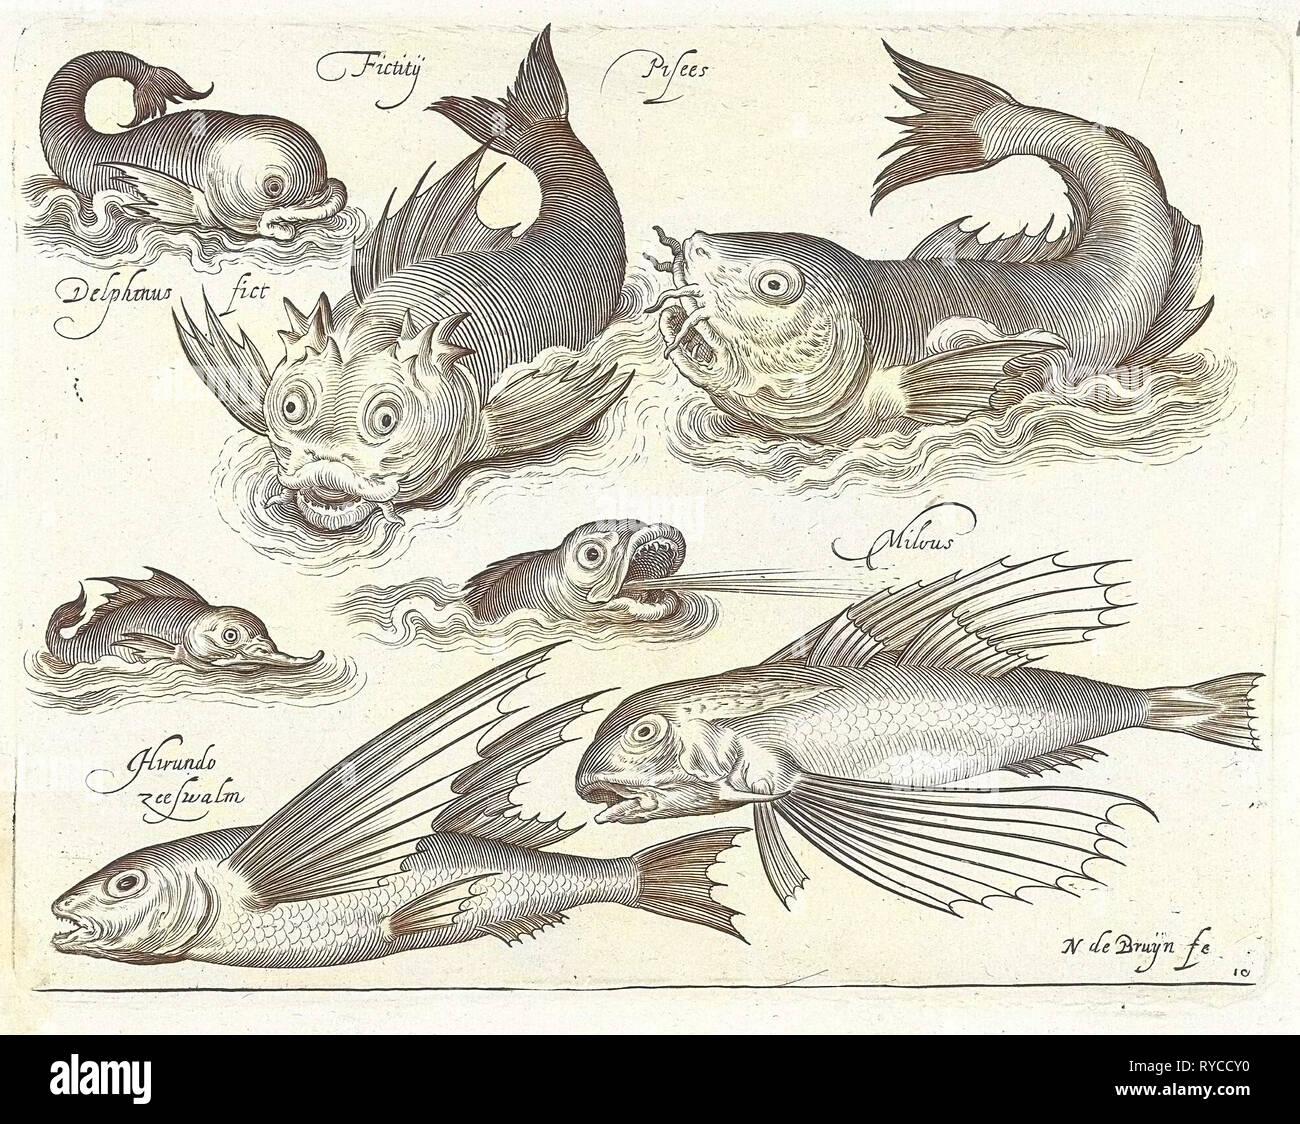 Fantastic invertebrates, including dolphin and dragonet, Nicolaes de Bruyn, 1581-1656 - Stock Image